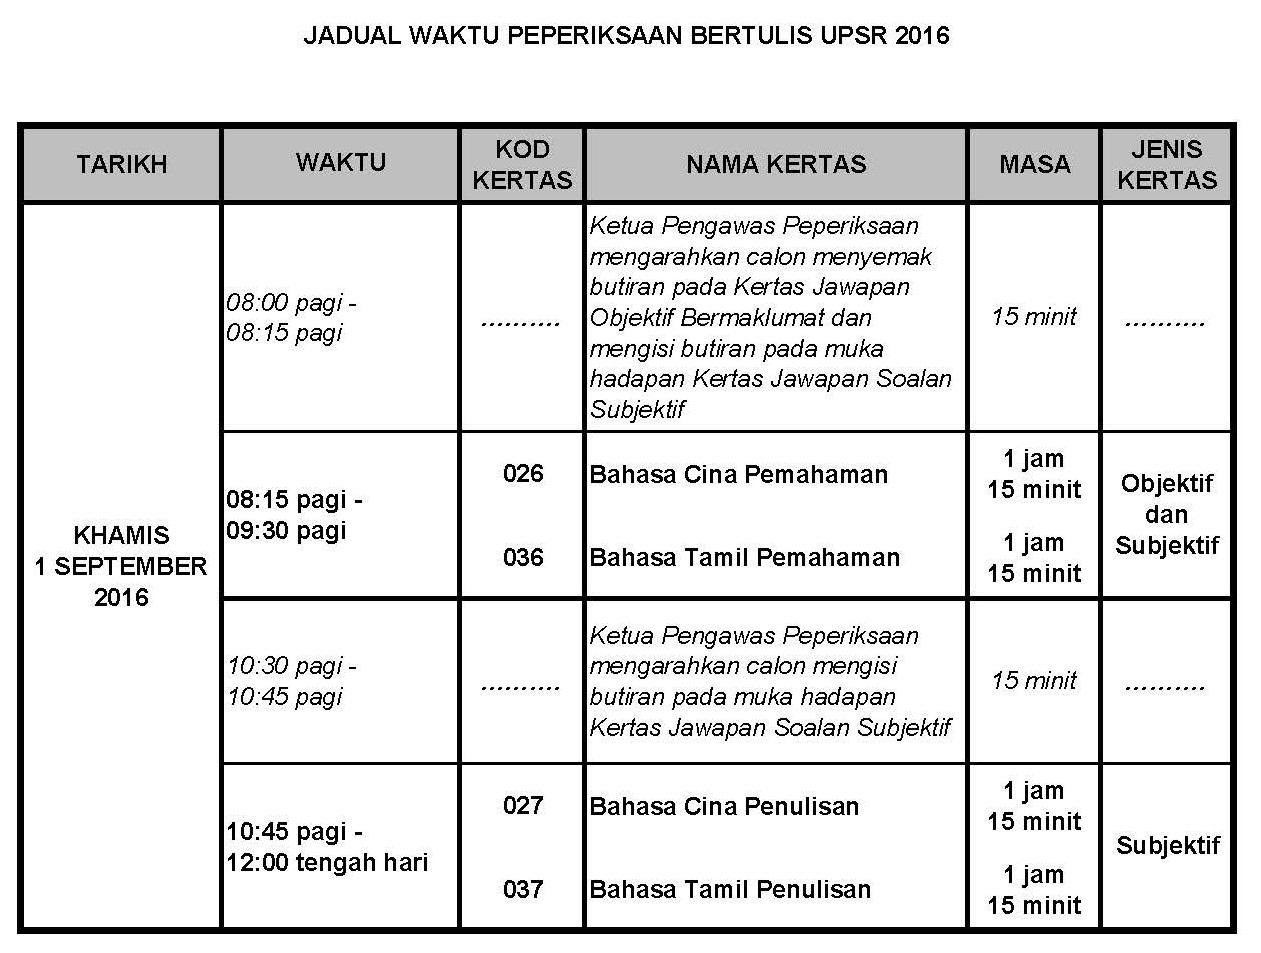 jadual waktu peperiksaan upsr Jadual waktu peperiksaan upsr 2017 ok jadual waktu peperiksaan upsr 2017 article at saps ibubapa.